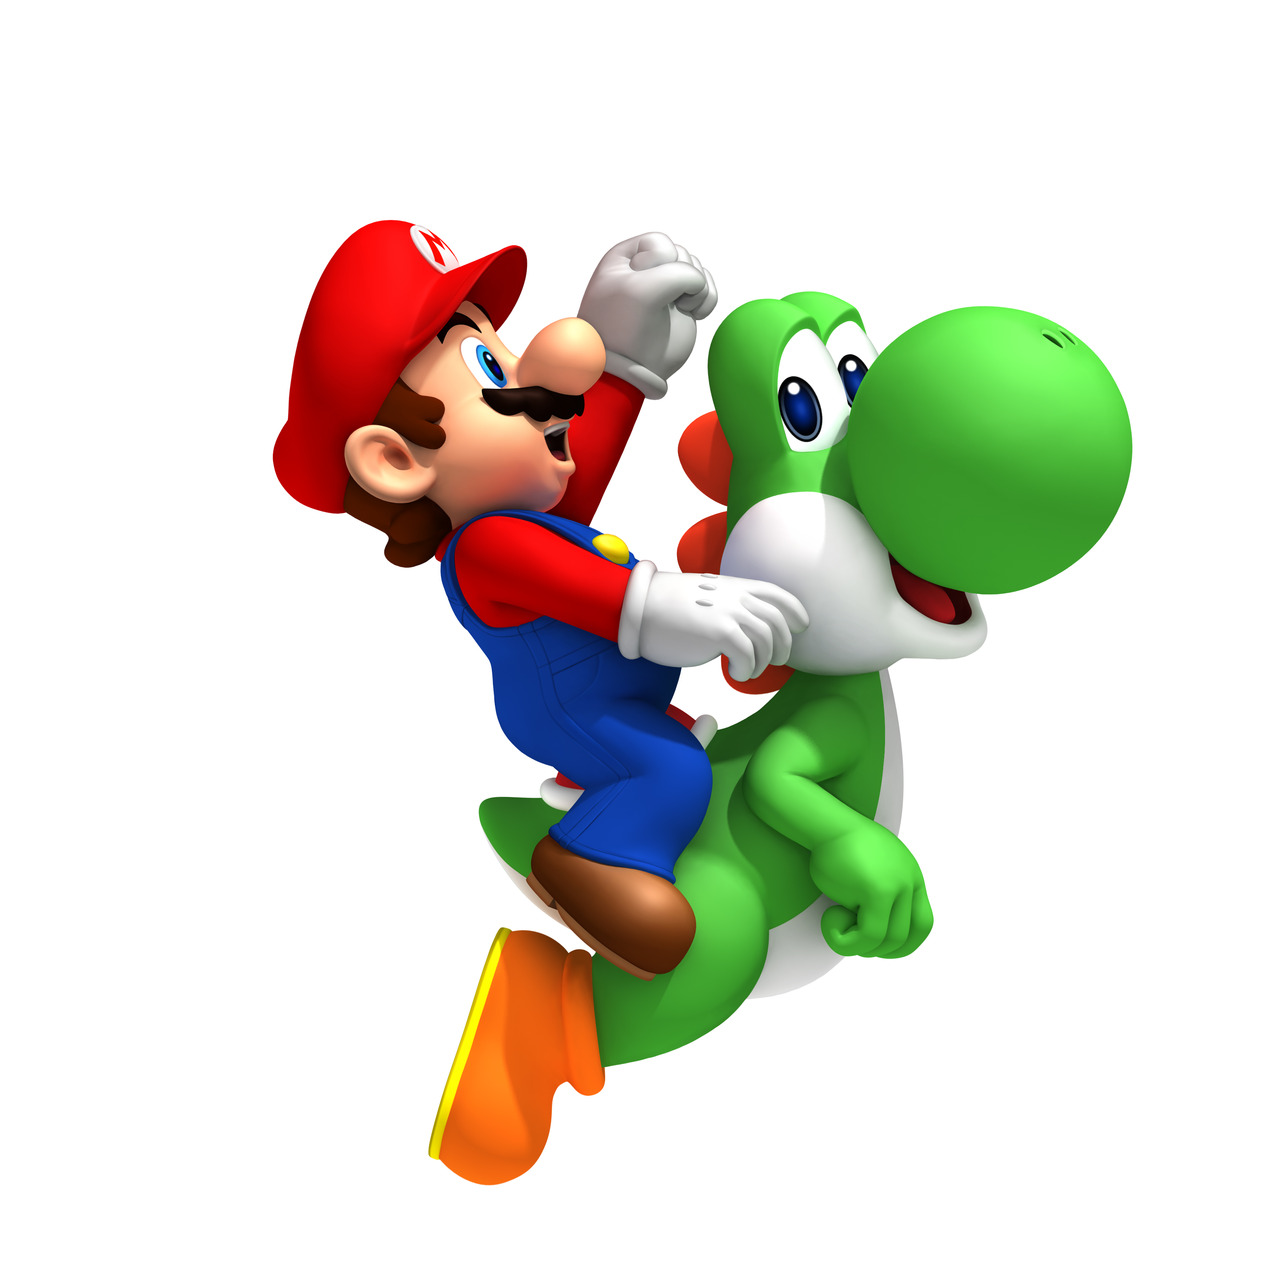 Coloriage Gratuit A Imprimer Mario Yoshi.Coloriage Mario Yoshi A Imprimer